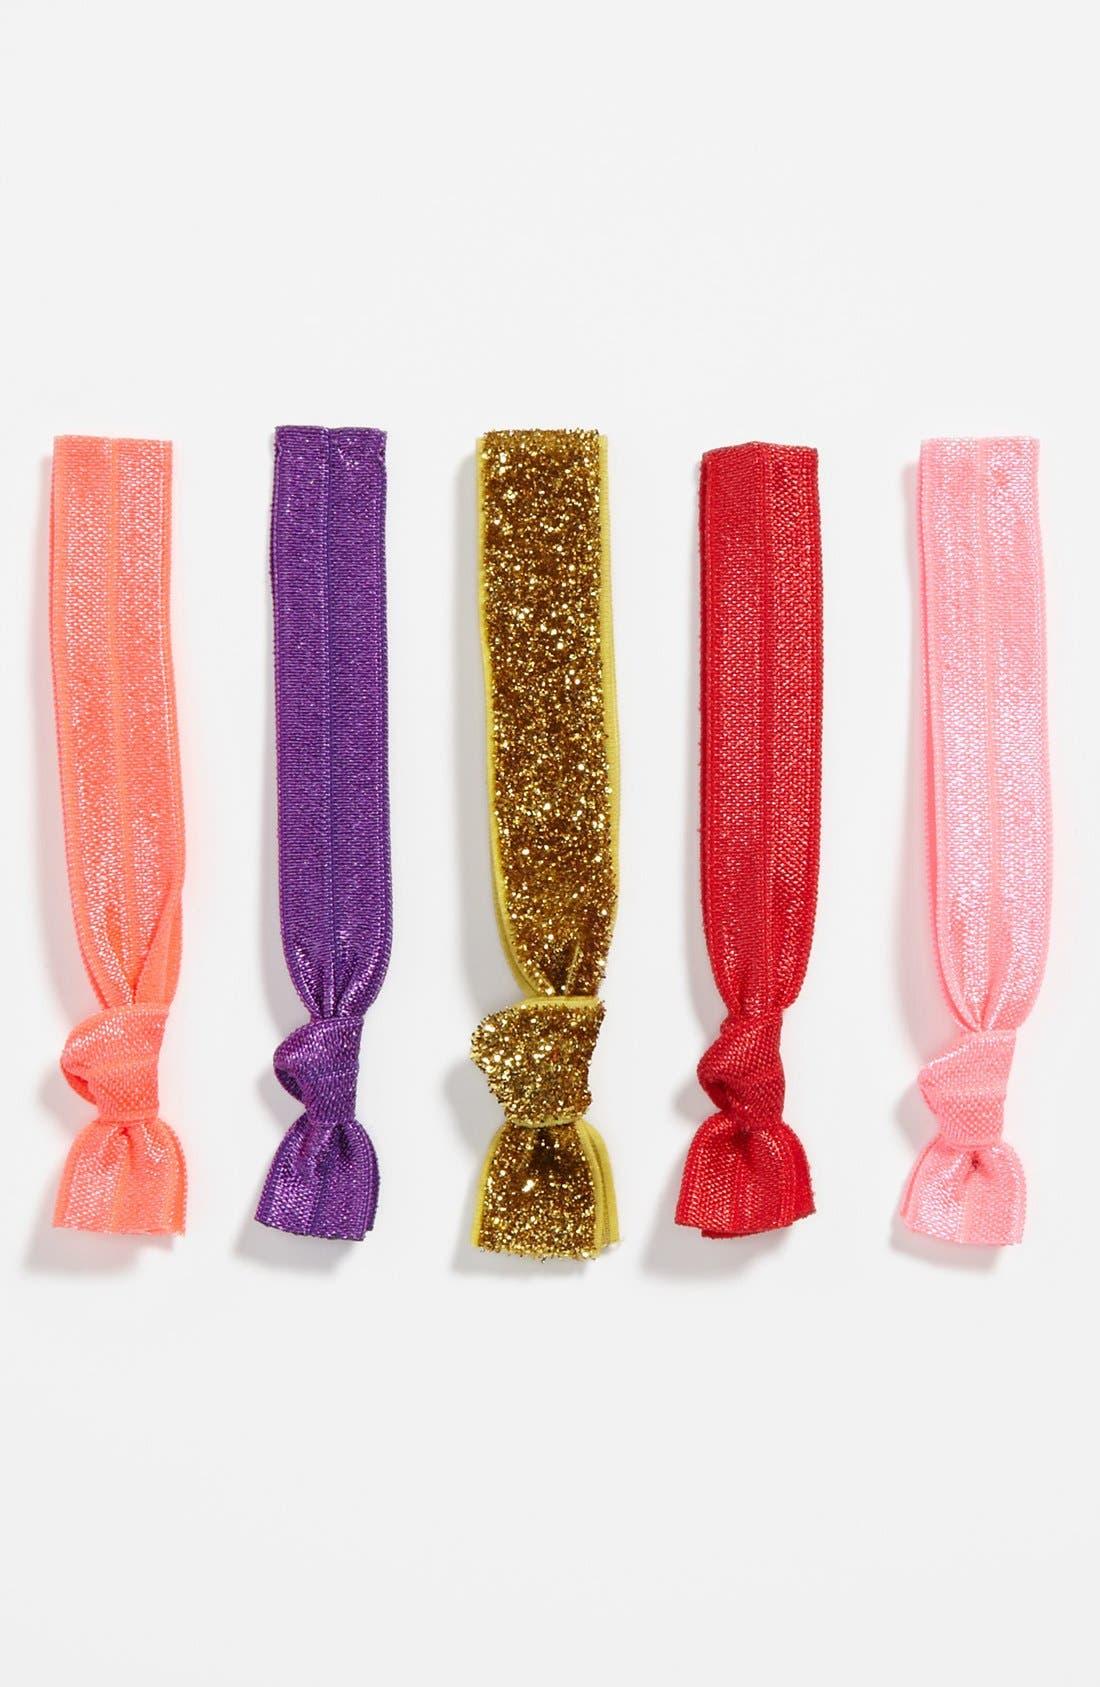 Main Image - Kitsch Hair Ties (5-Pack) (Girls)